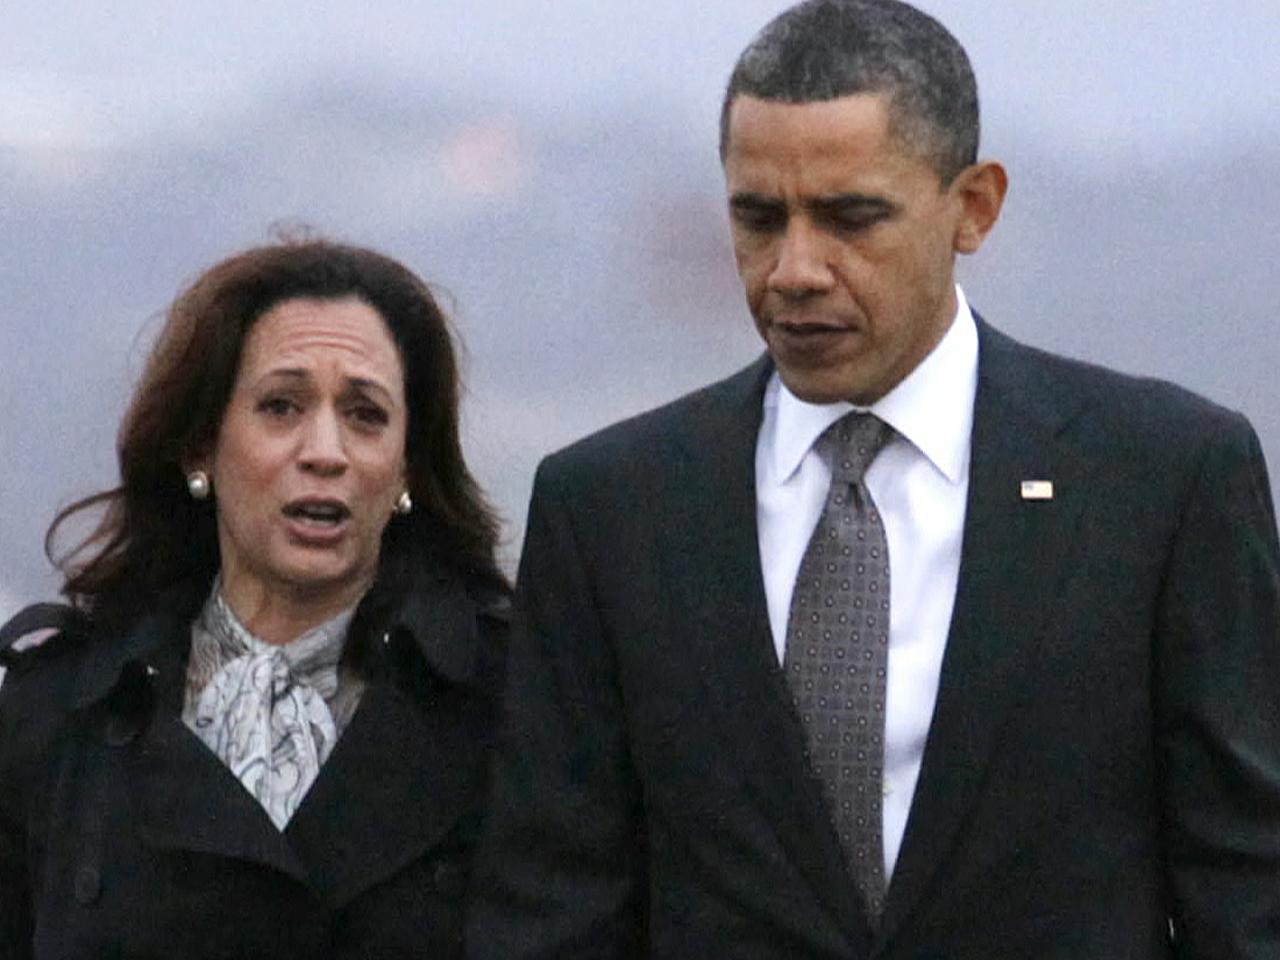 Obama S Kamala Harris Compliment Sparks Criticism